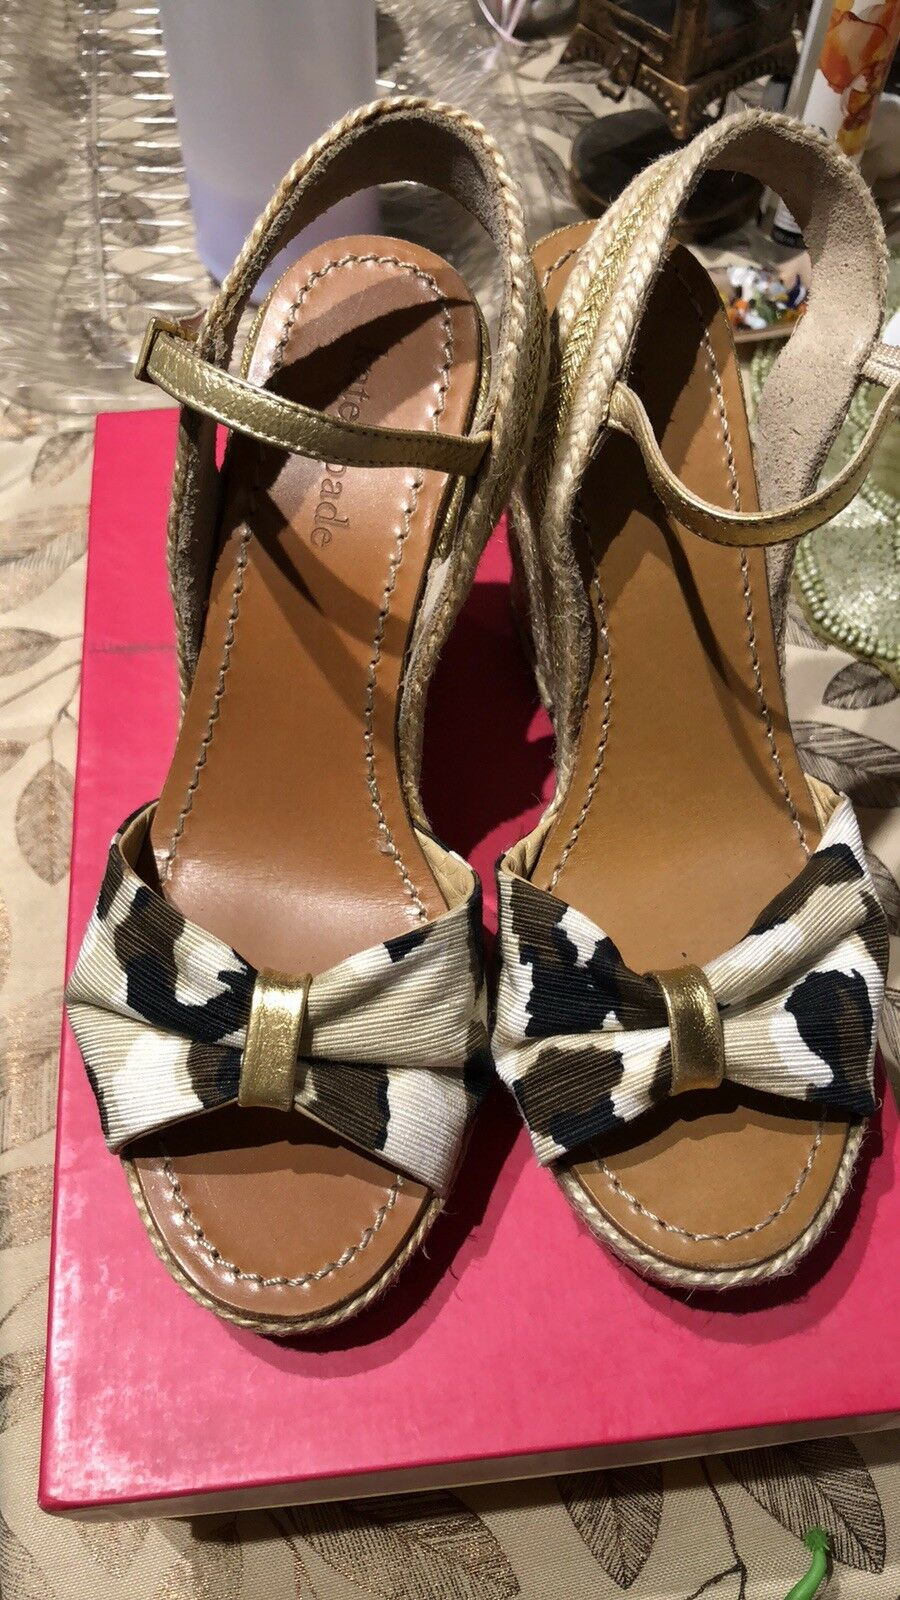 kate spade shoes 6 - image 2